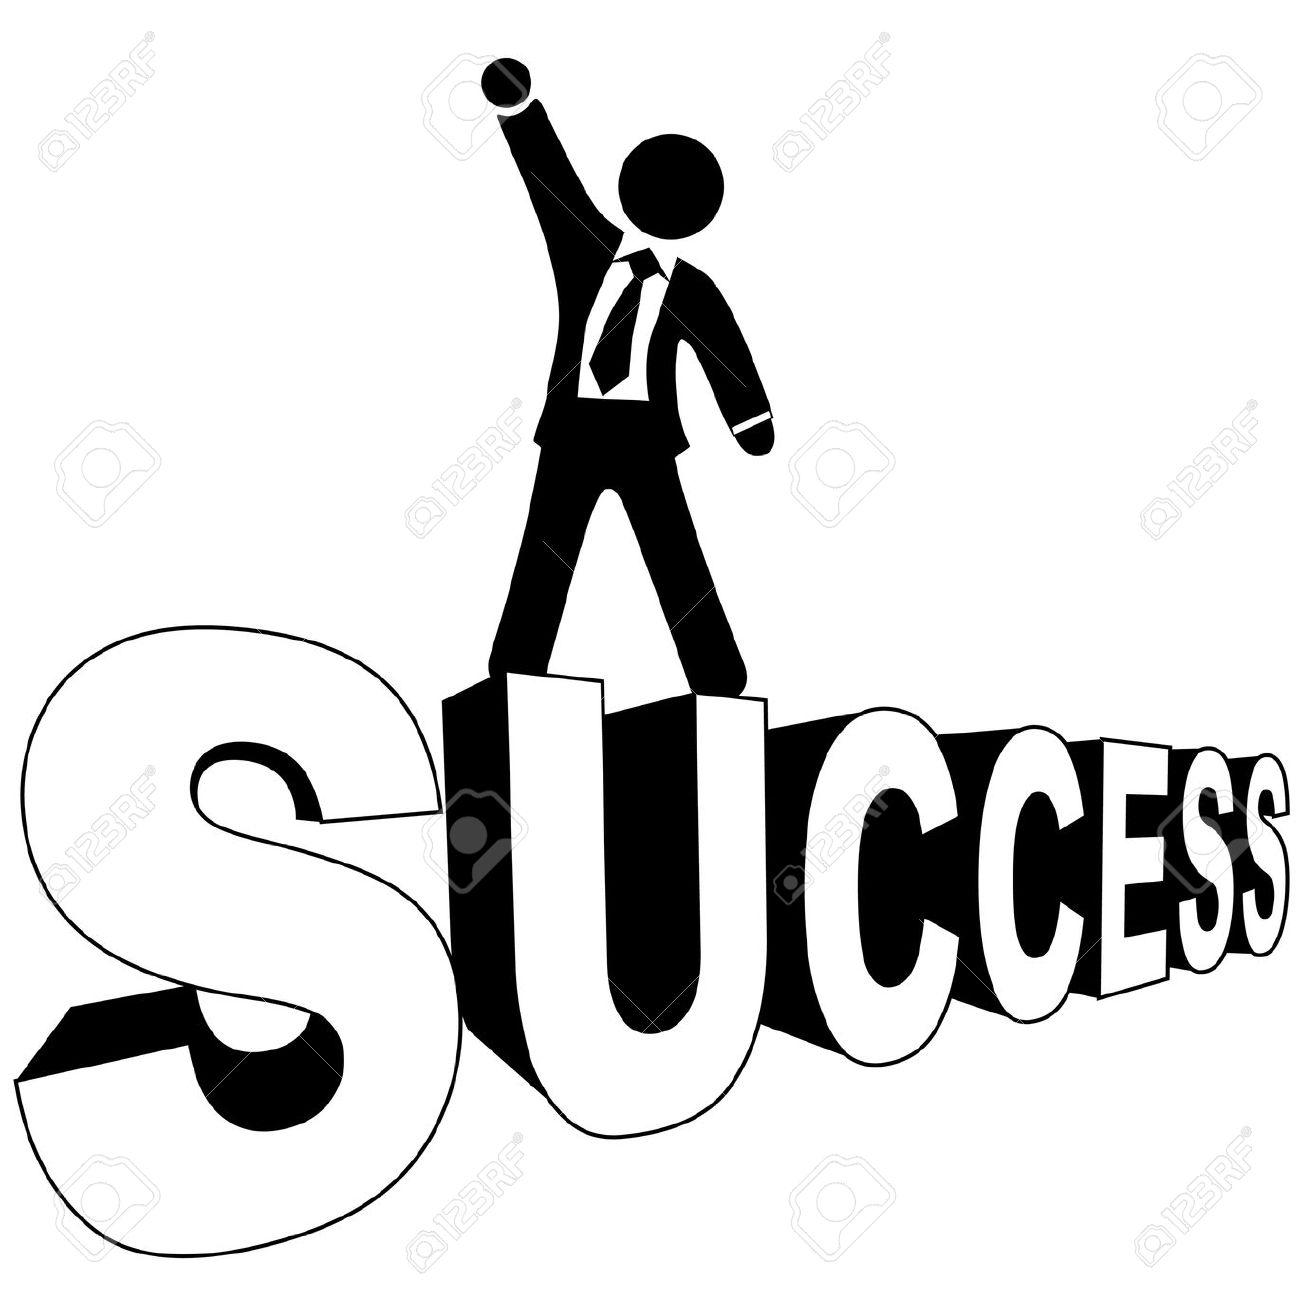 success clipart